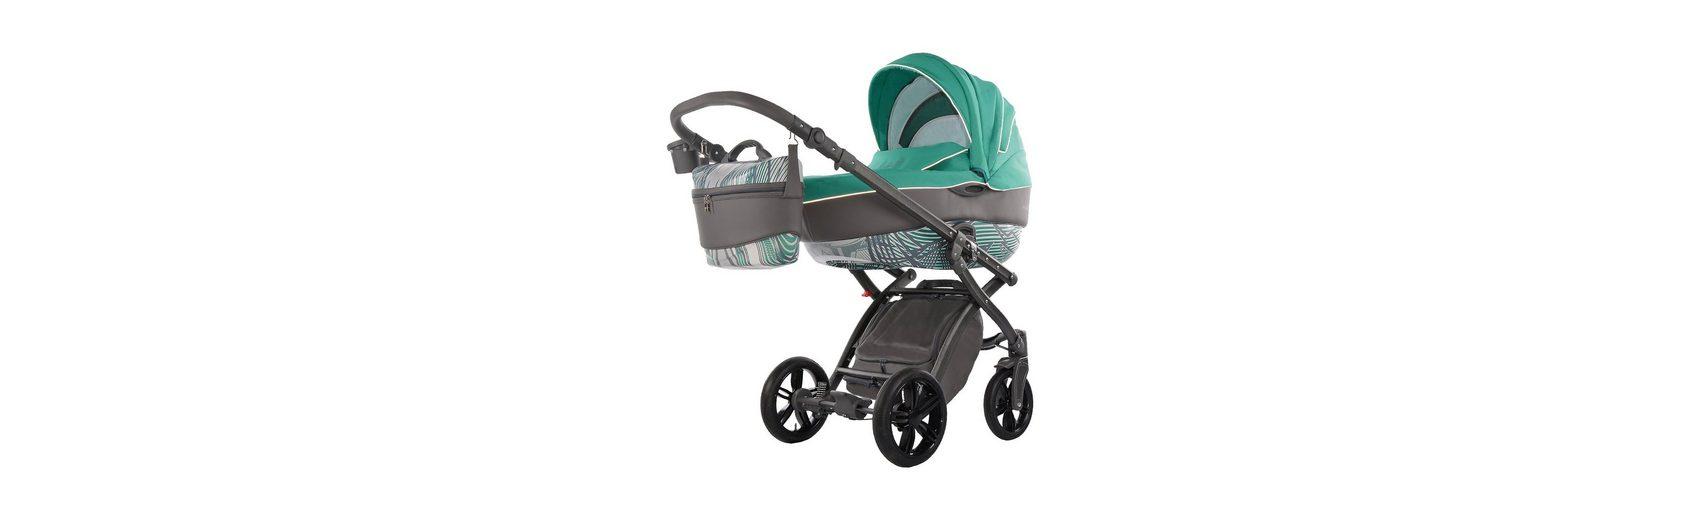 knorr-baby Kombi Kinderwagen Alive Energy, grün